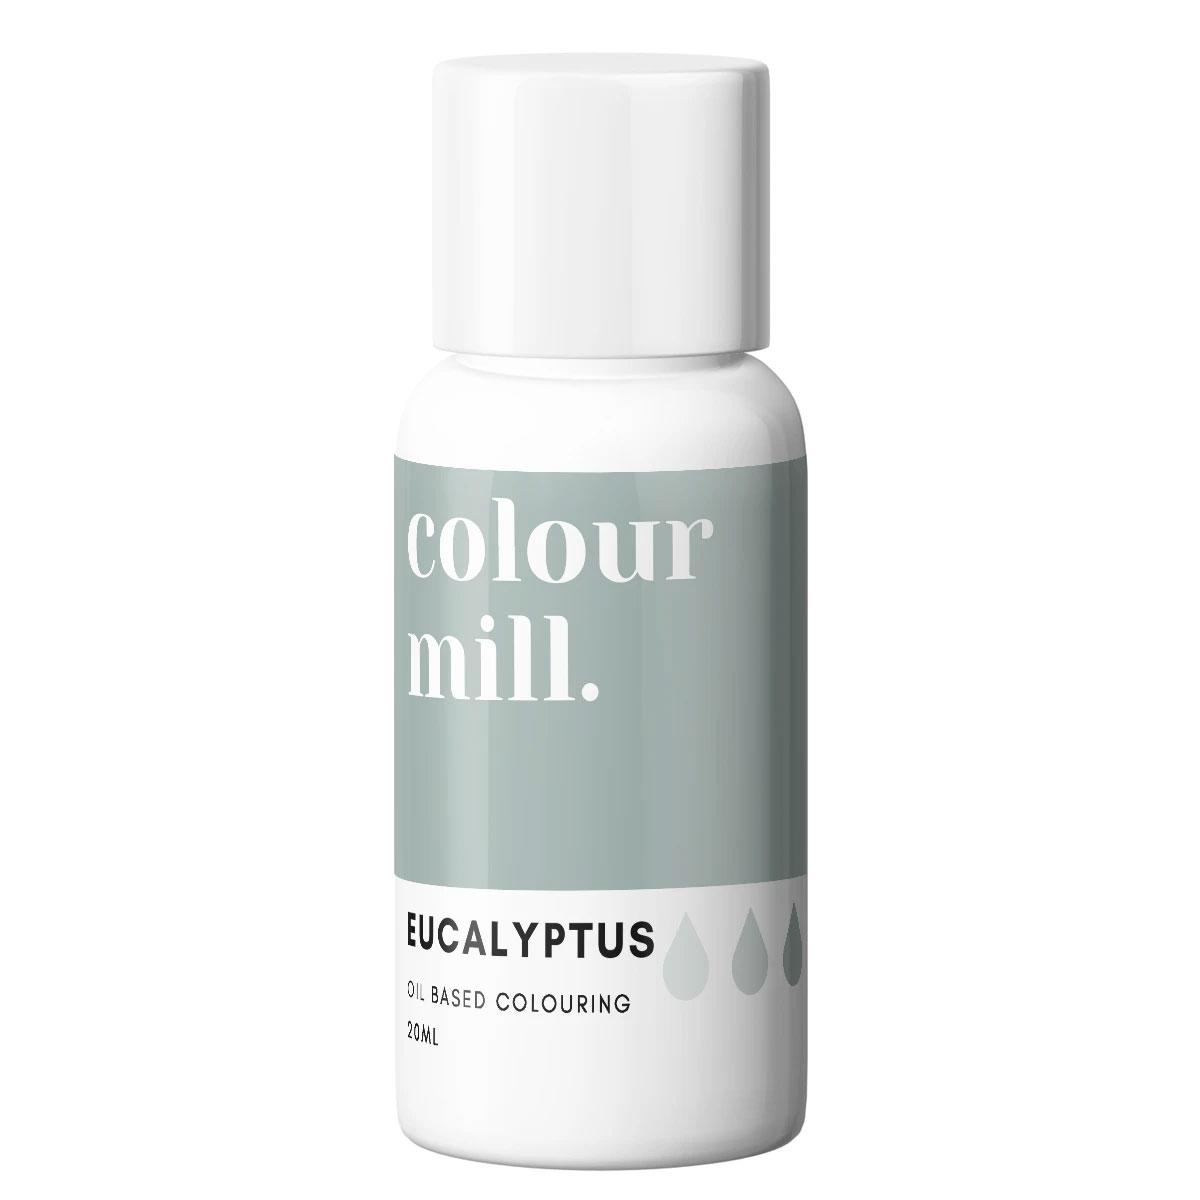 Colour Mill fettlösliche Lebensmittelfarbe - Eucalyptus 20ml